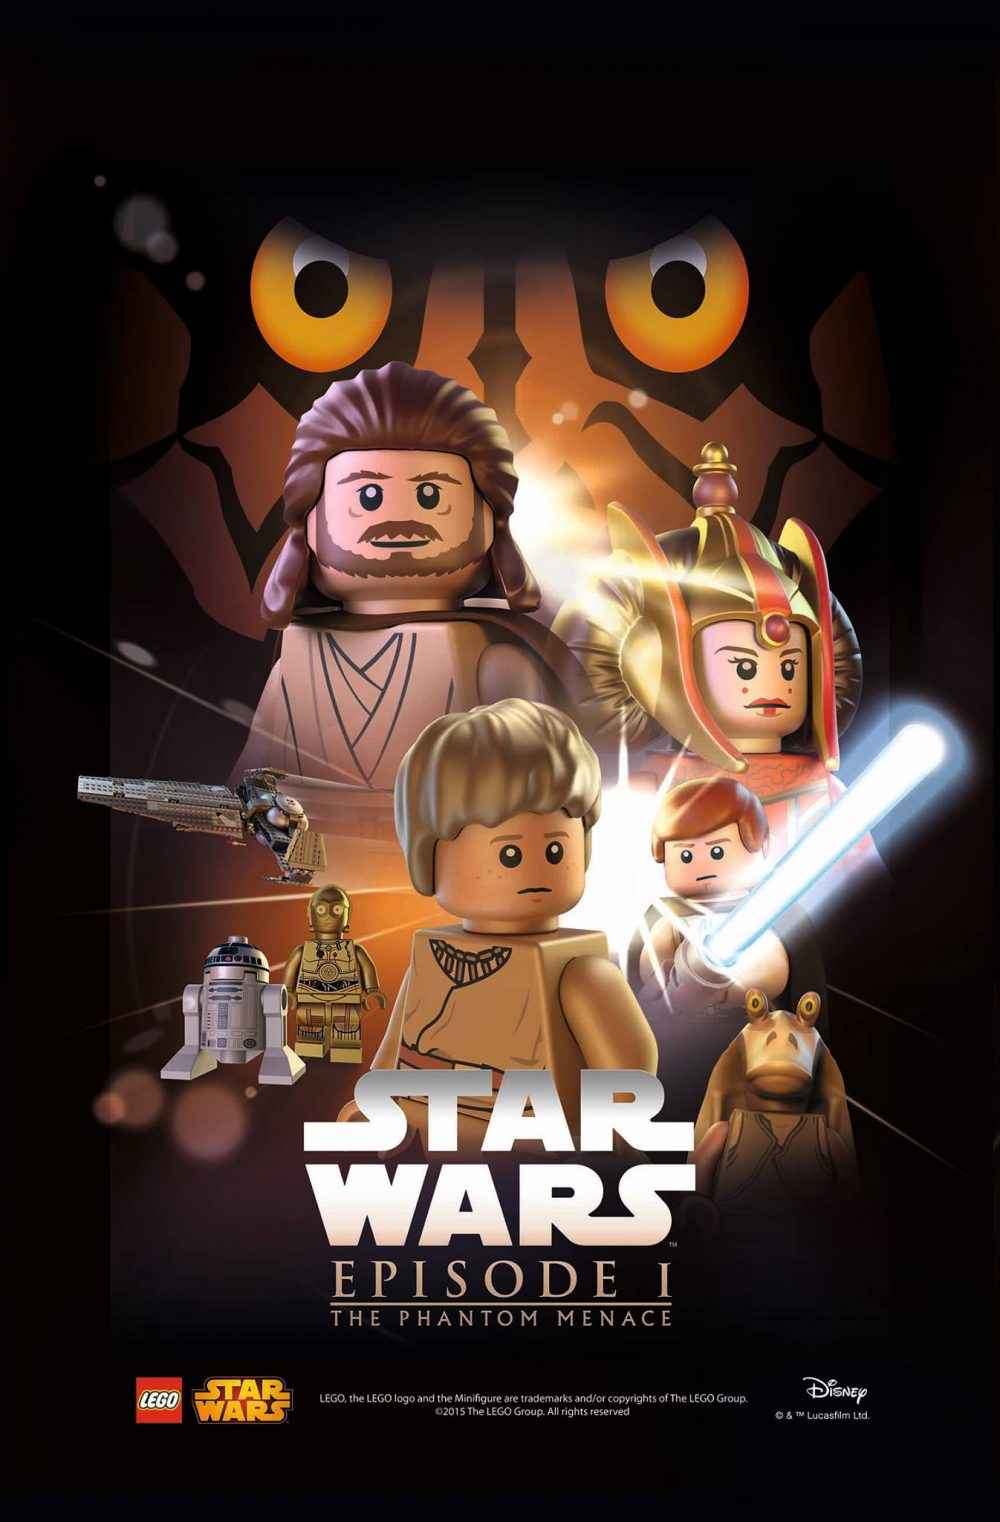 star wars lego poster episodio 1